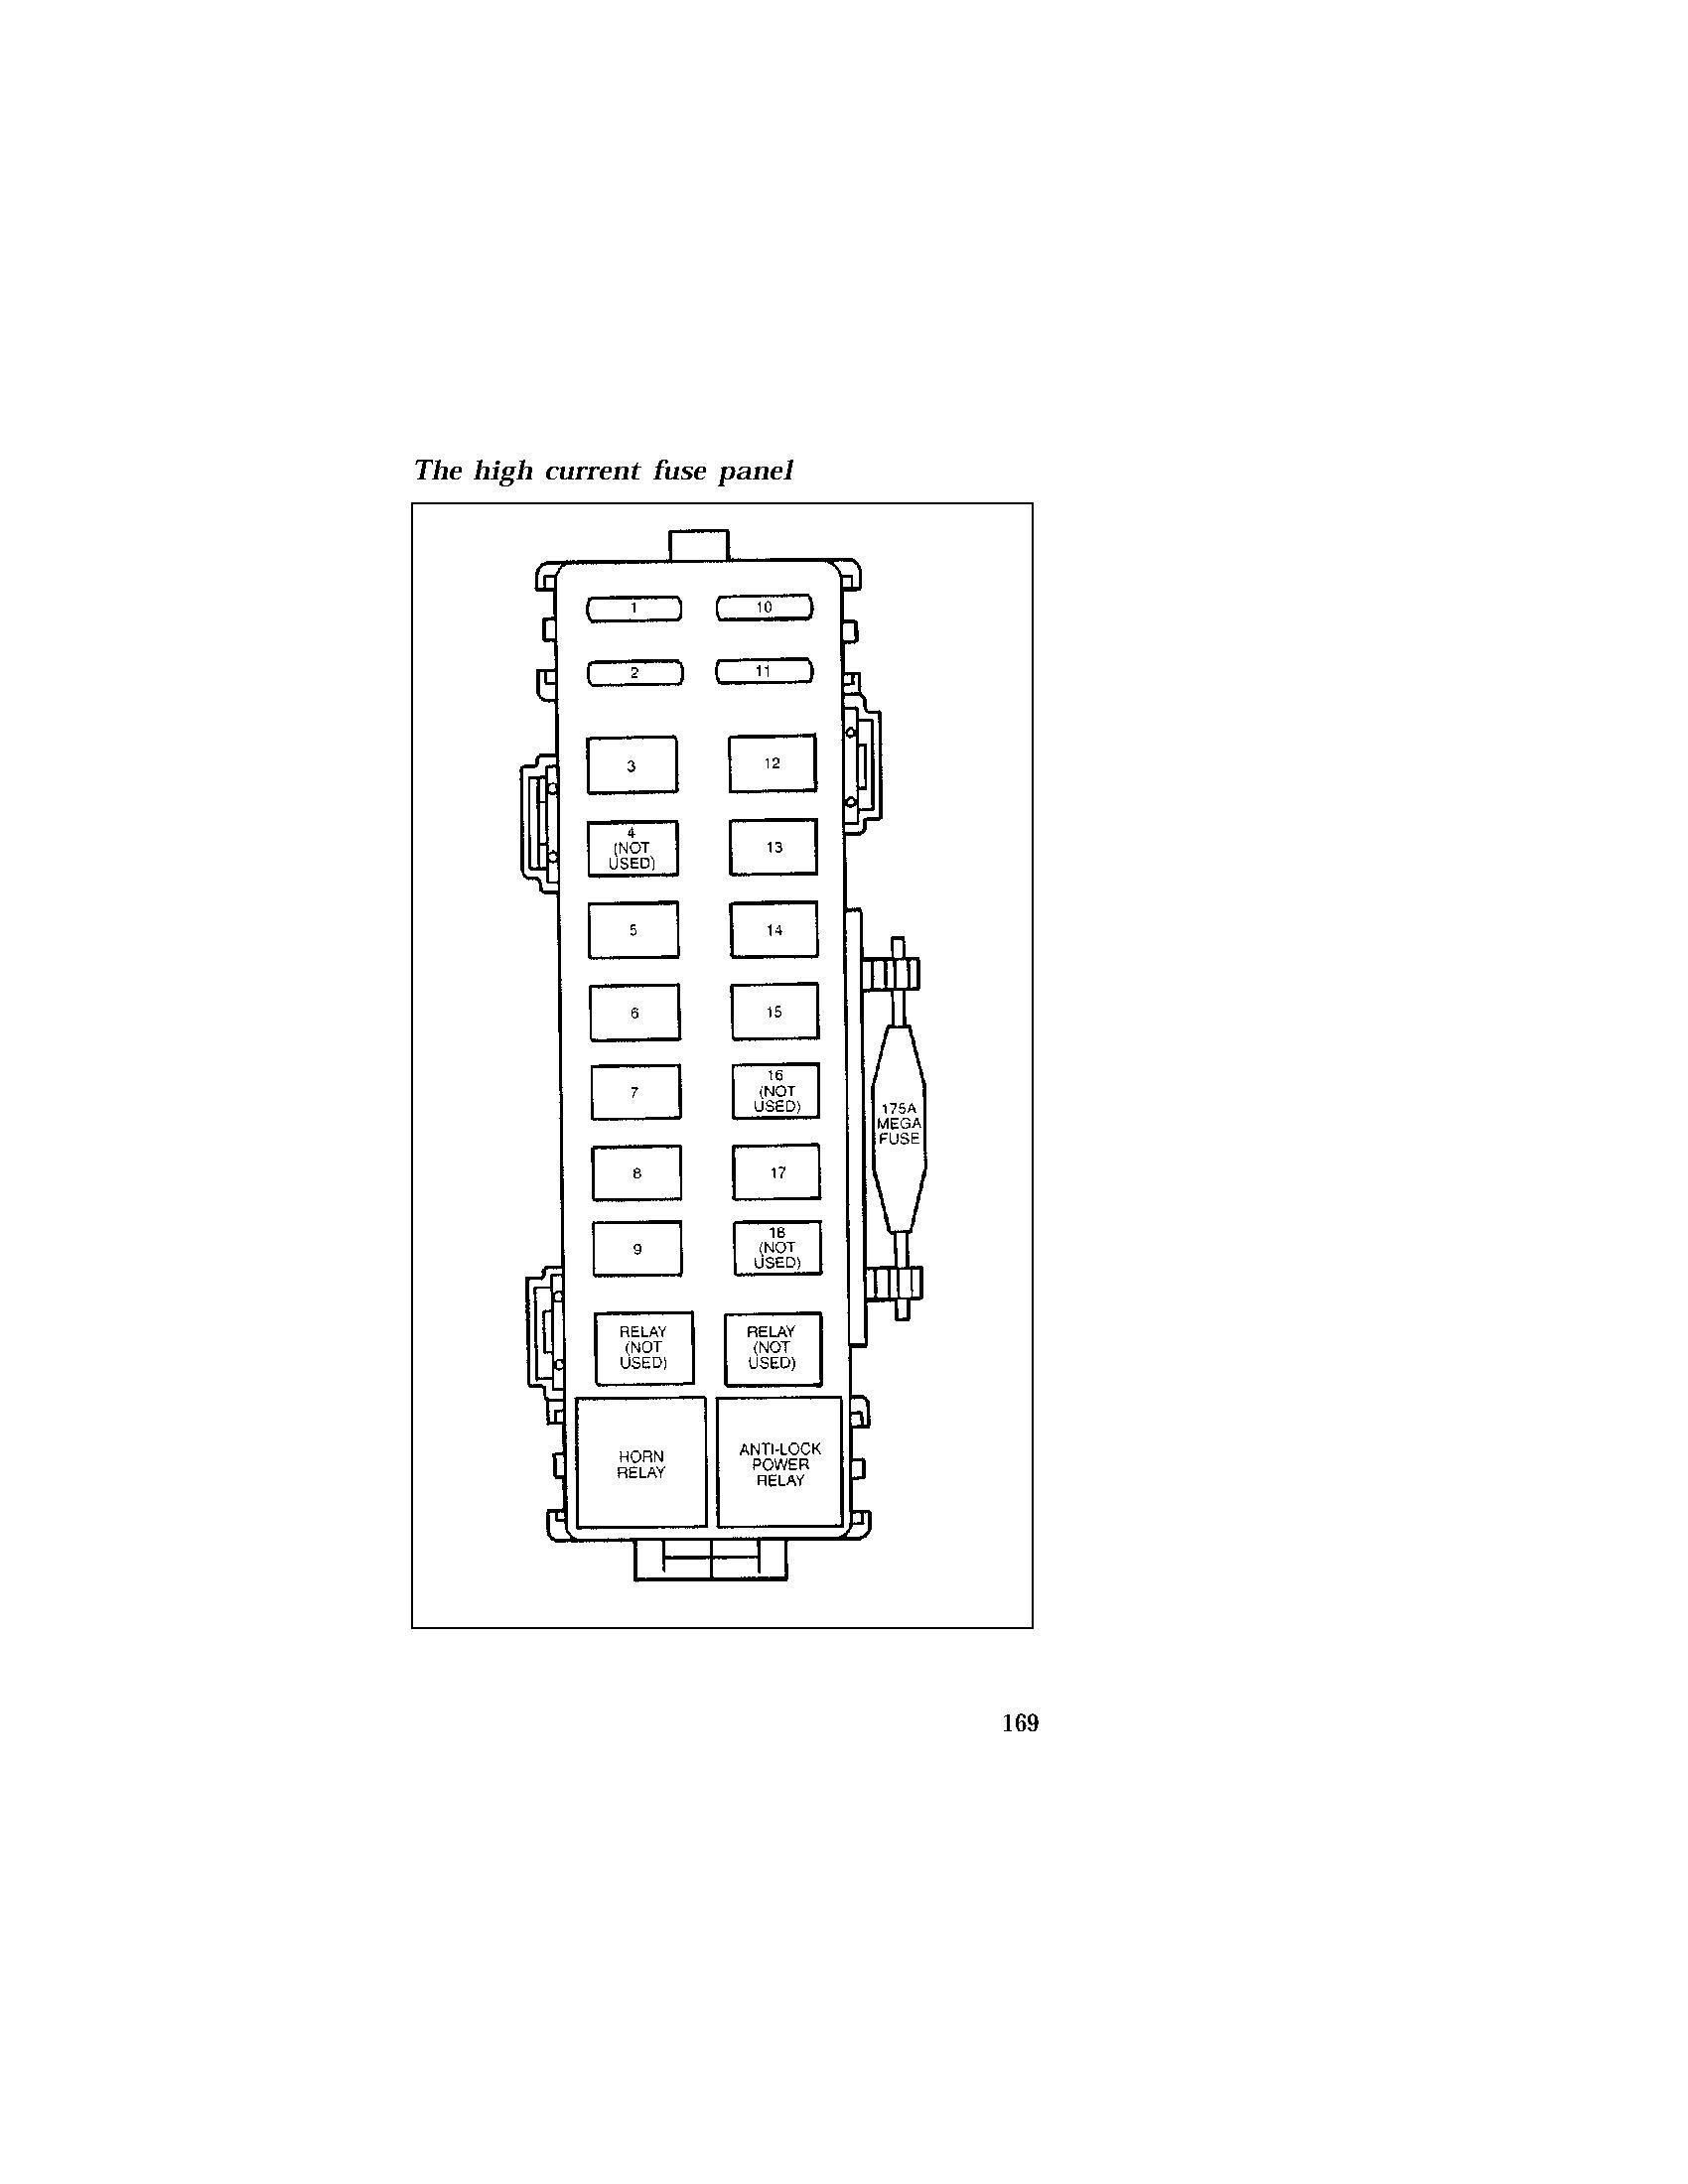 1994 ford thunderbird fuse box diagram er 7672  ford thunderbird fuse diagram  er 7672  ford thunderbird fuse diagram